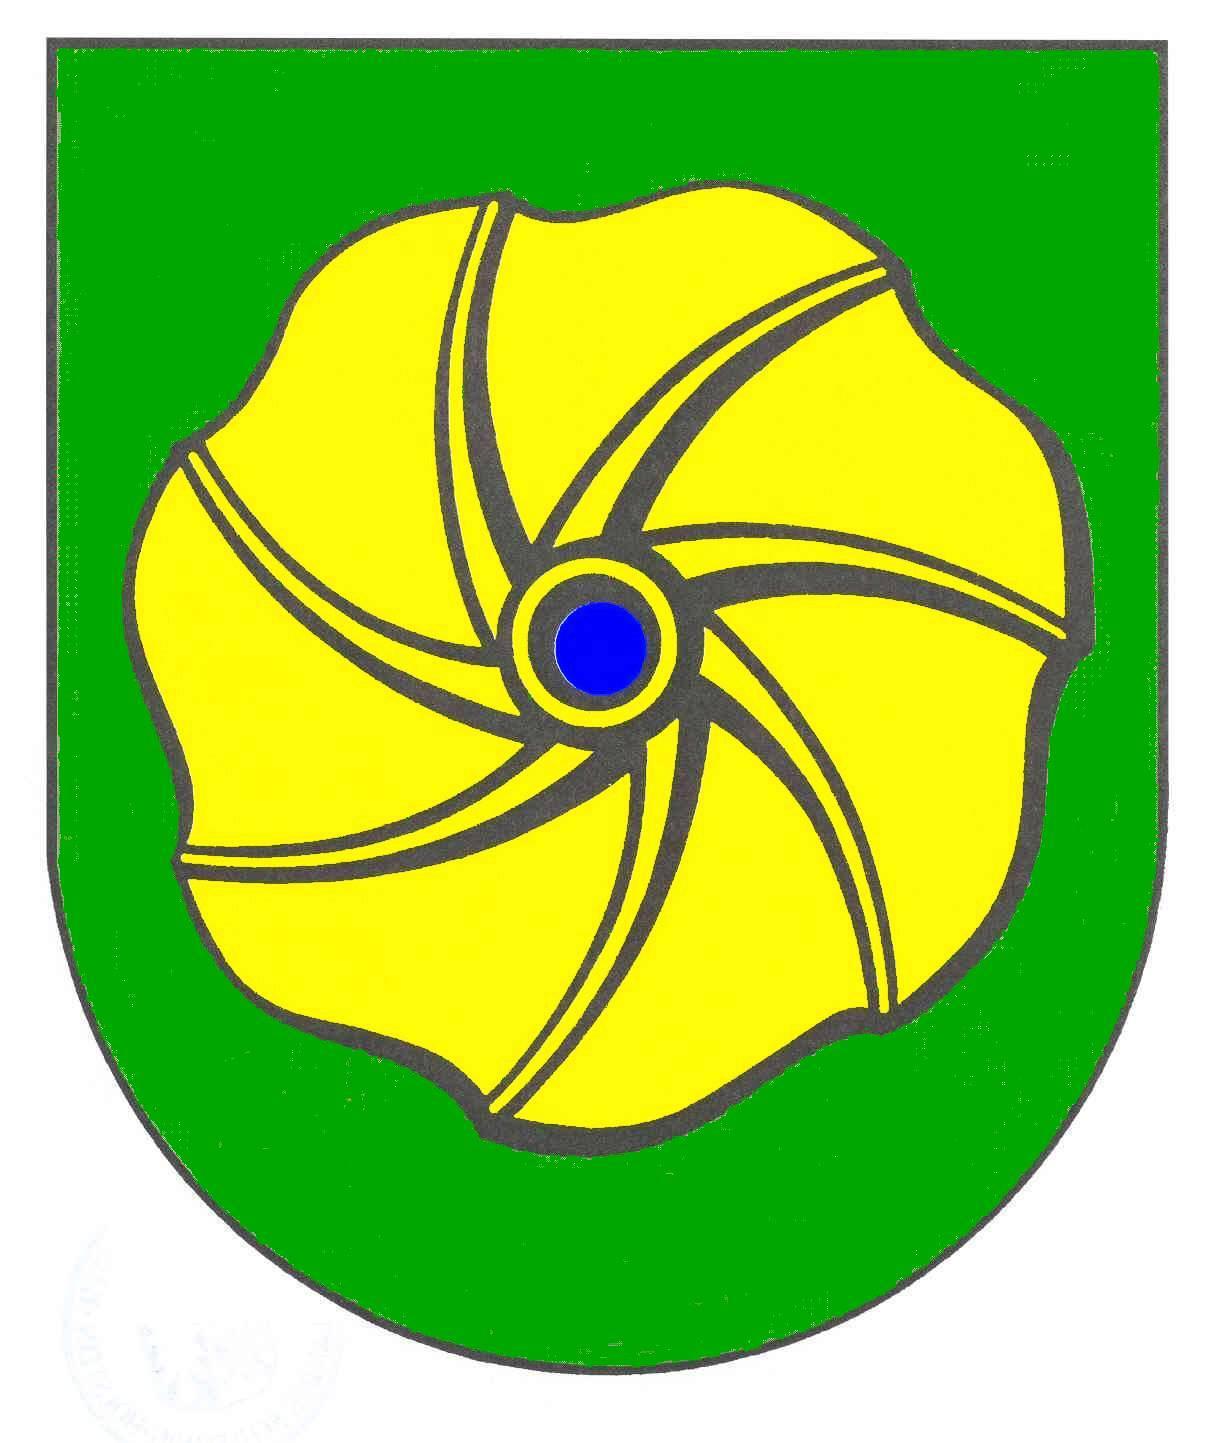 Wappen GemeindeHelse, Kreis Dithmarschen